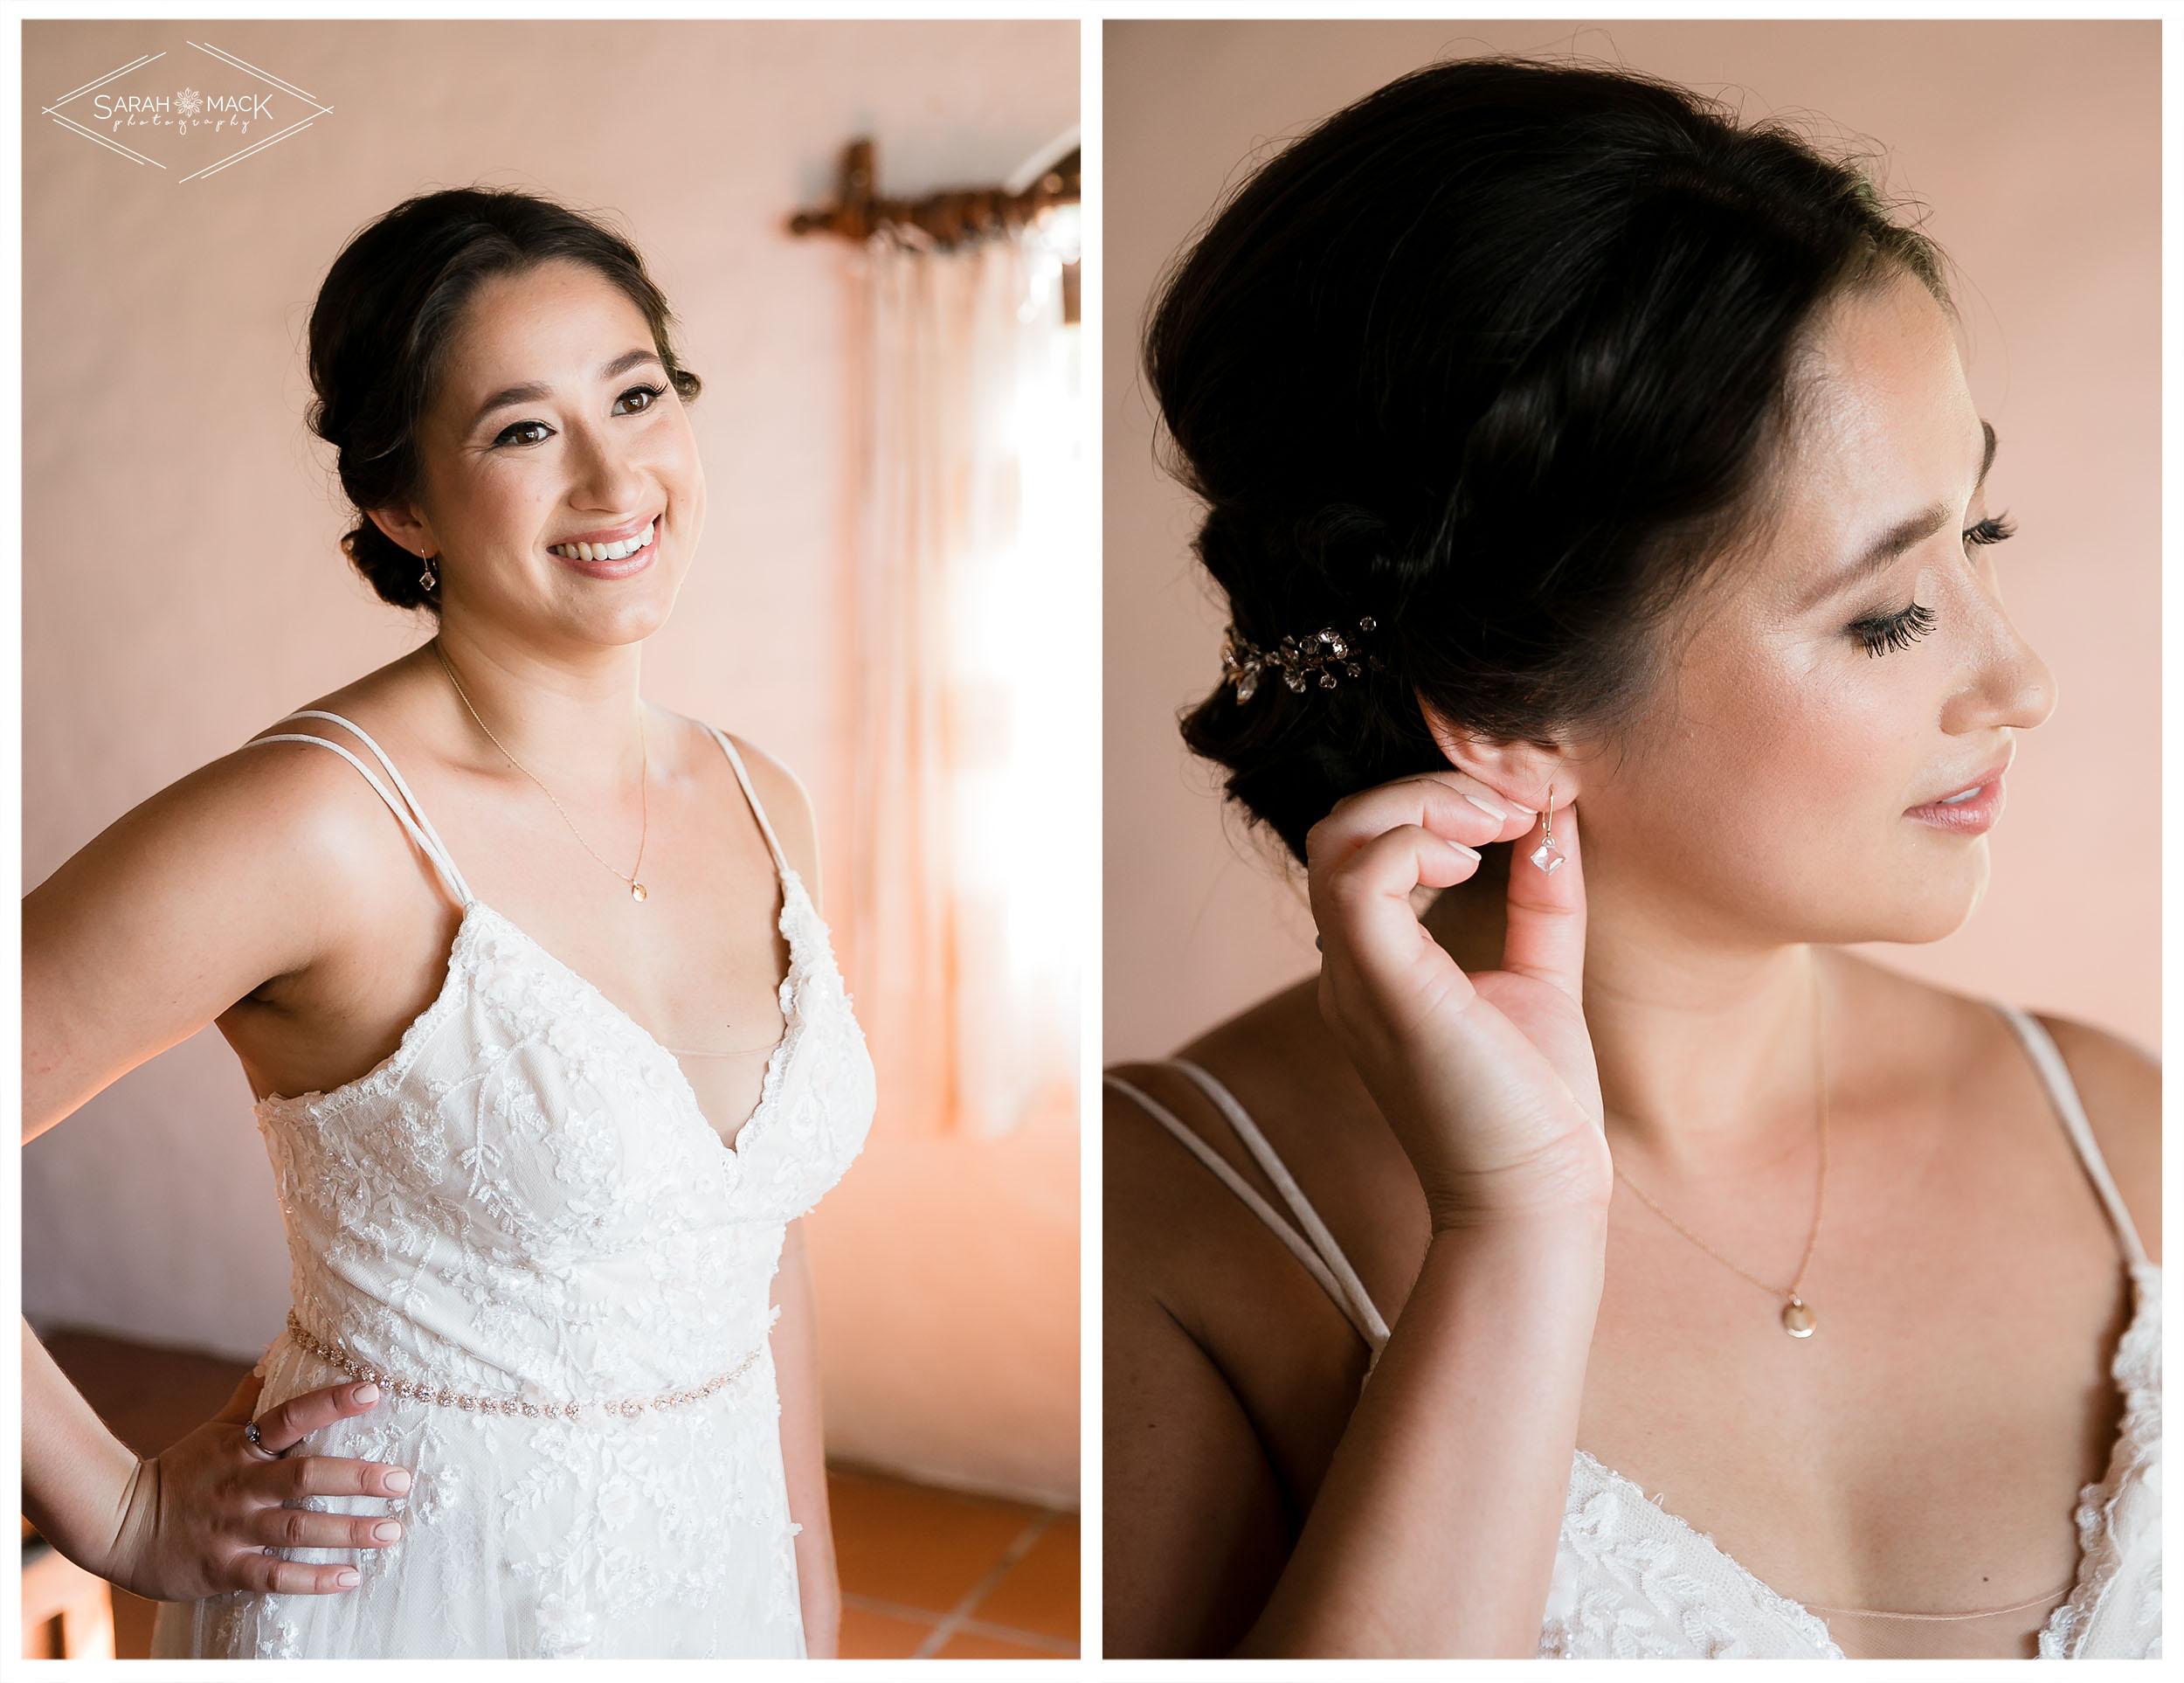 ES-Flor-de-Playa-Sayulita-Wedding-Photography-18.jpg